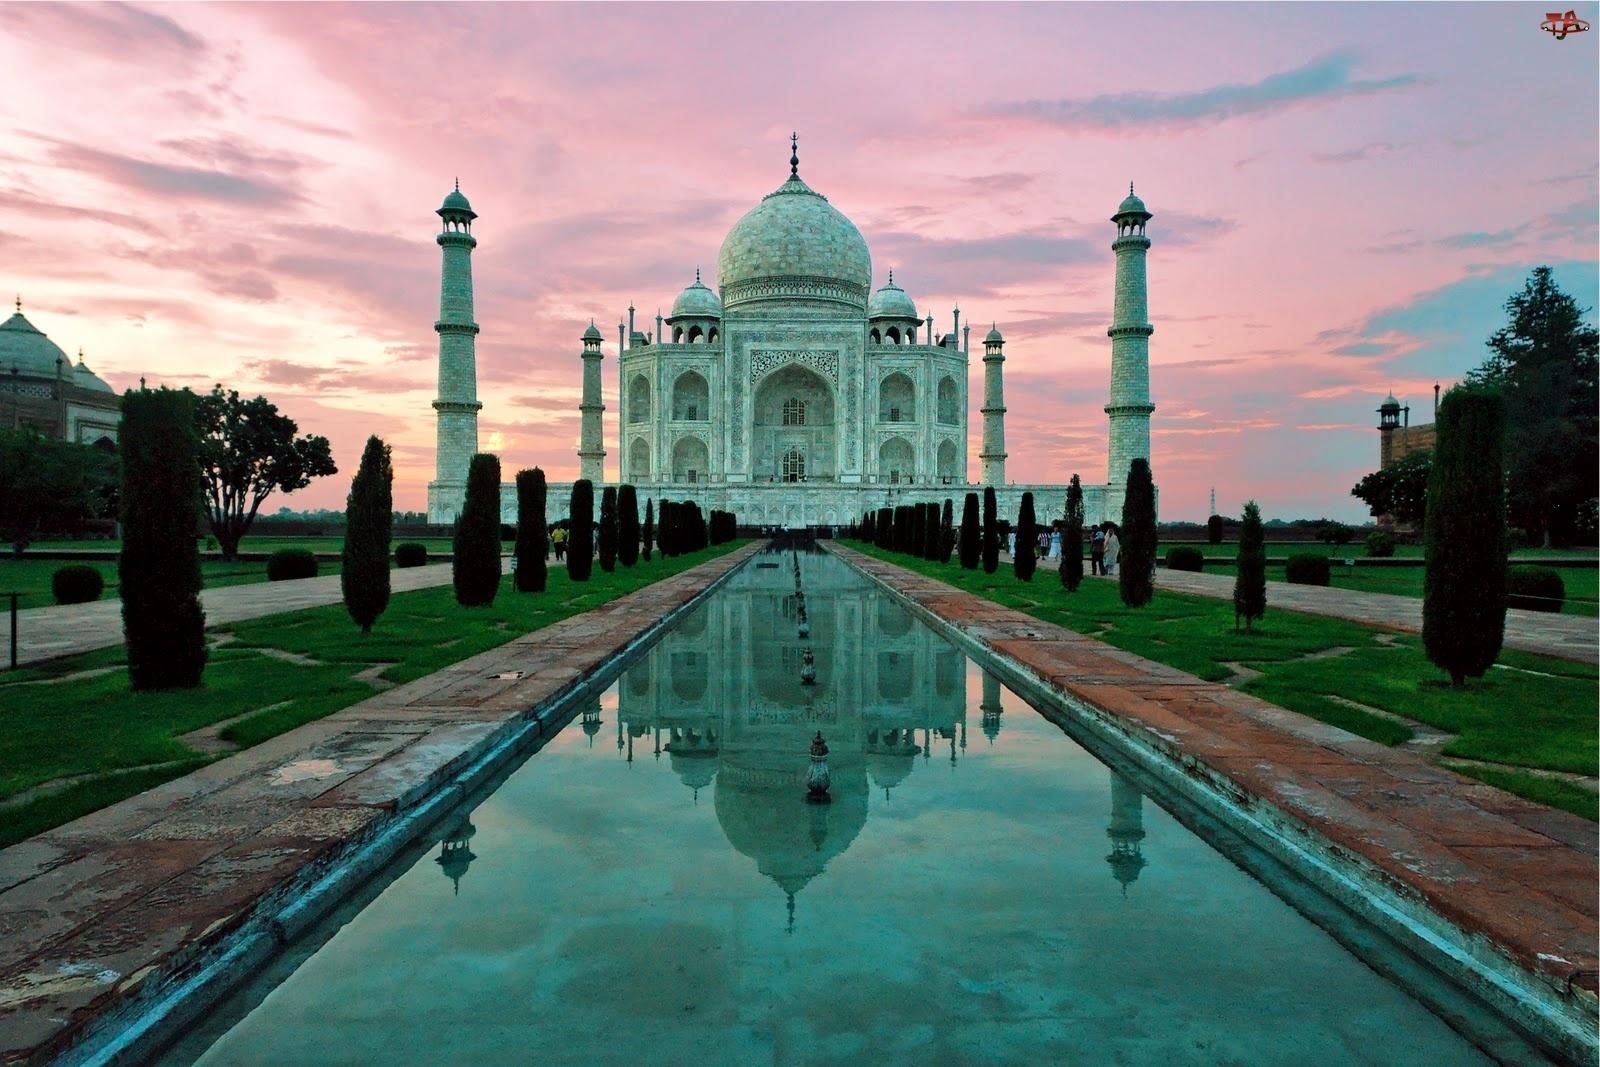 Mauzoleum, Sadzawka lustrzana, Agra, Indie, Tadź Mahal